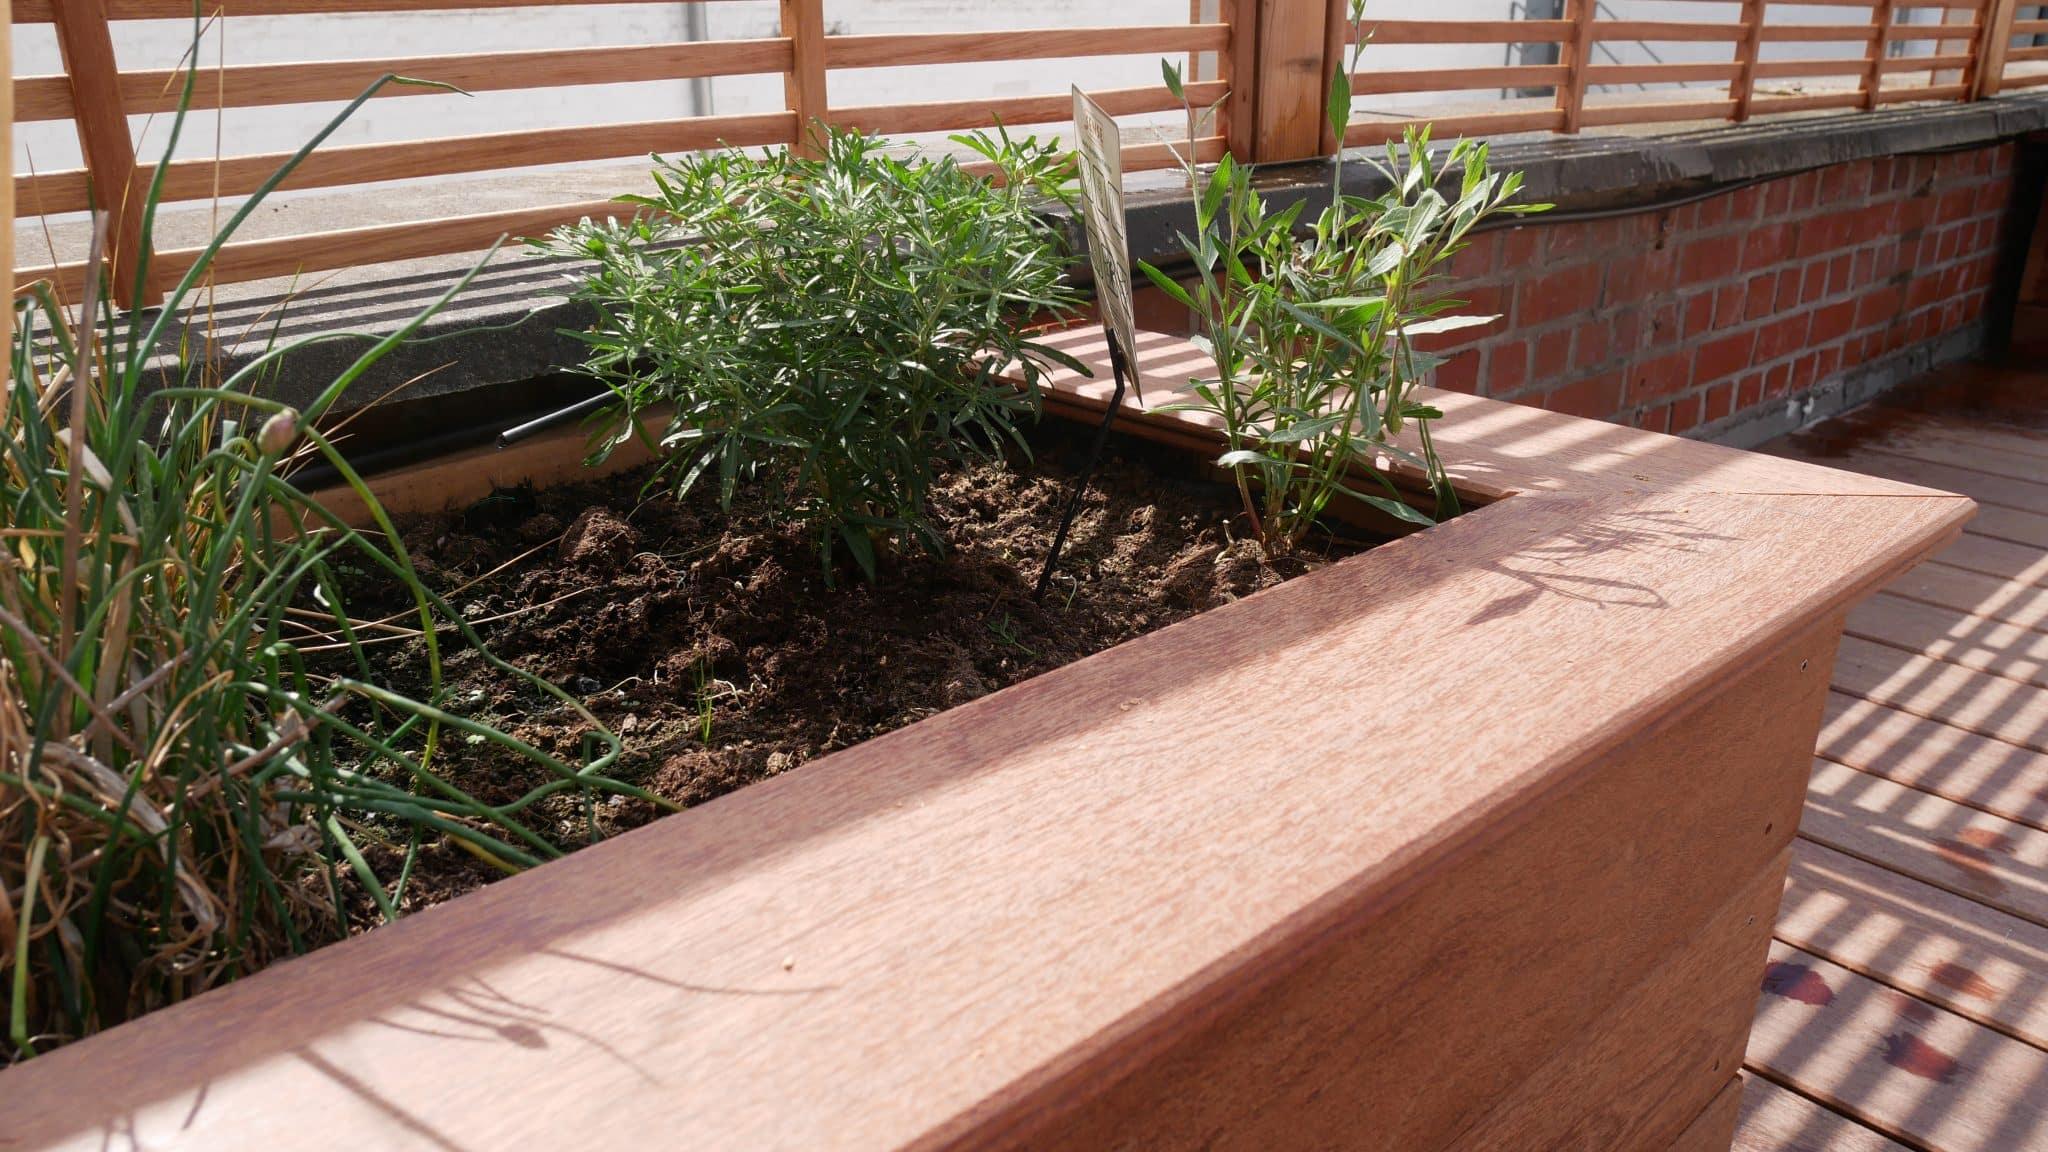 Terrasse en bois cumaru par plots sur toit plaisir vert for Embellir sa terrasse